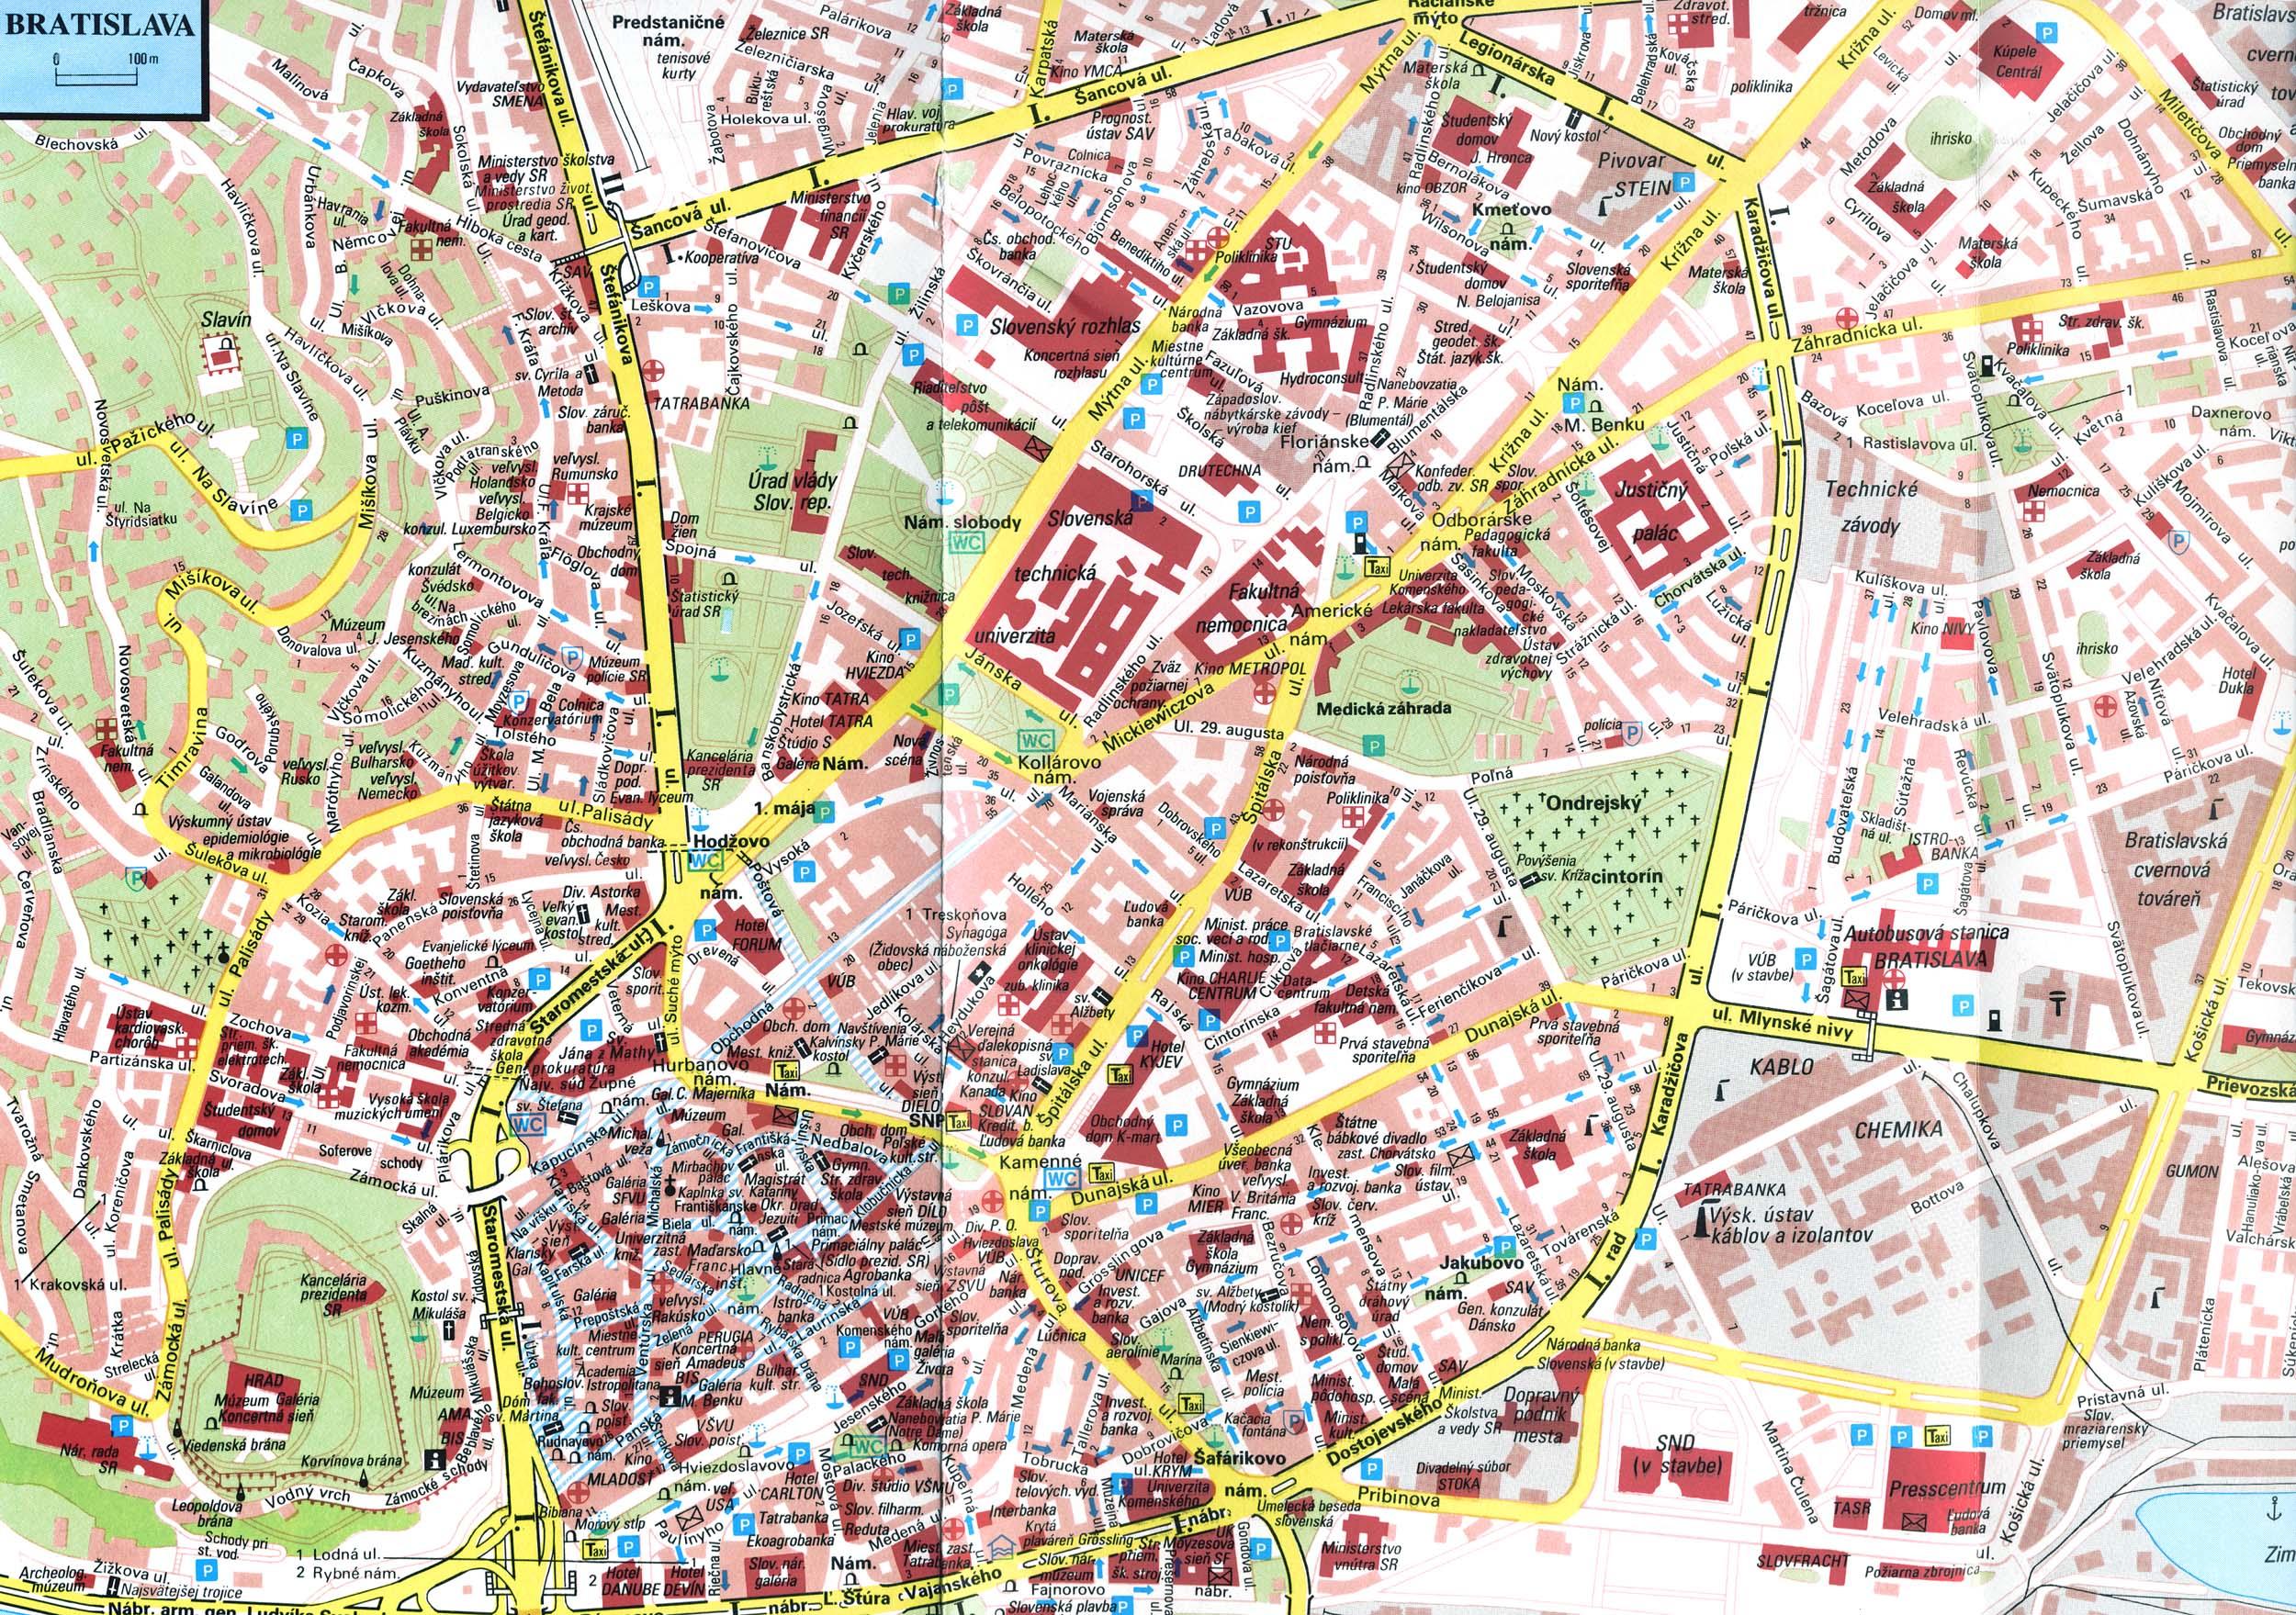 Travel to Bratislava Travel Maps to Bratislava Slovakia